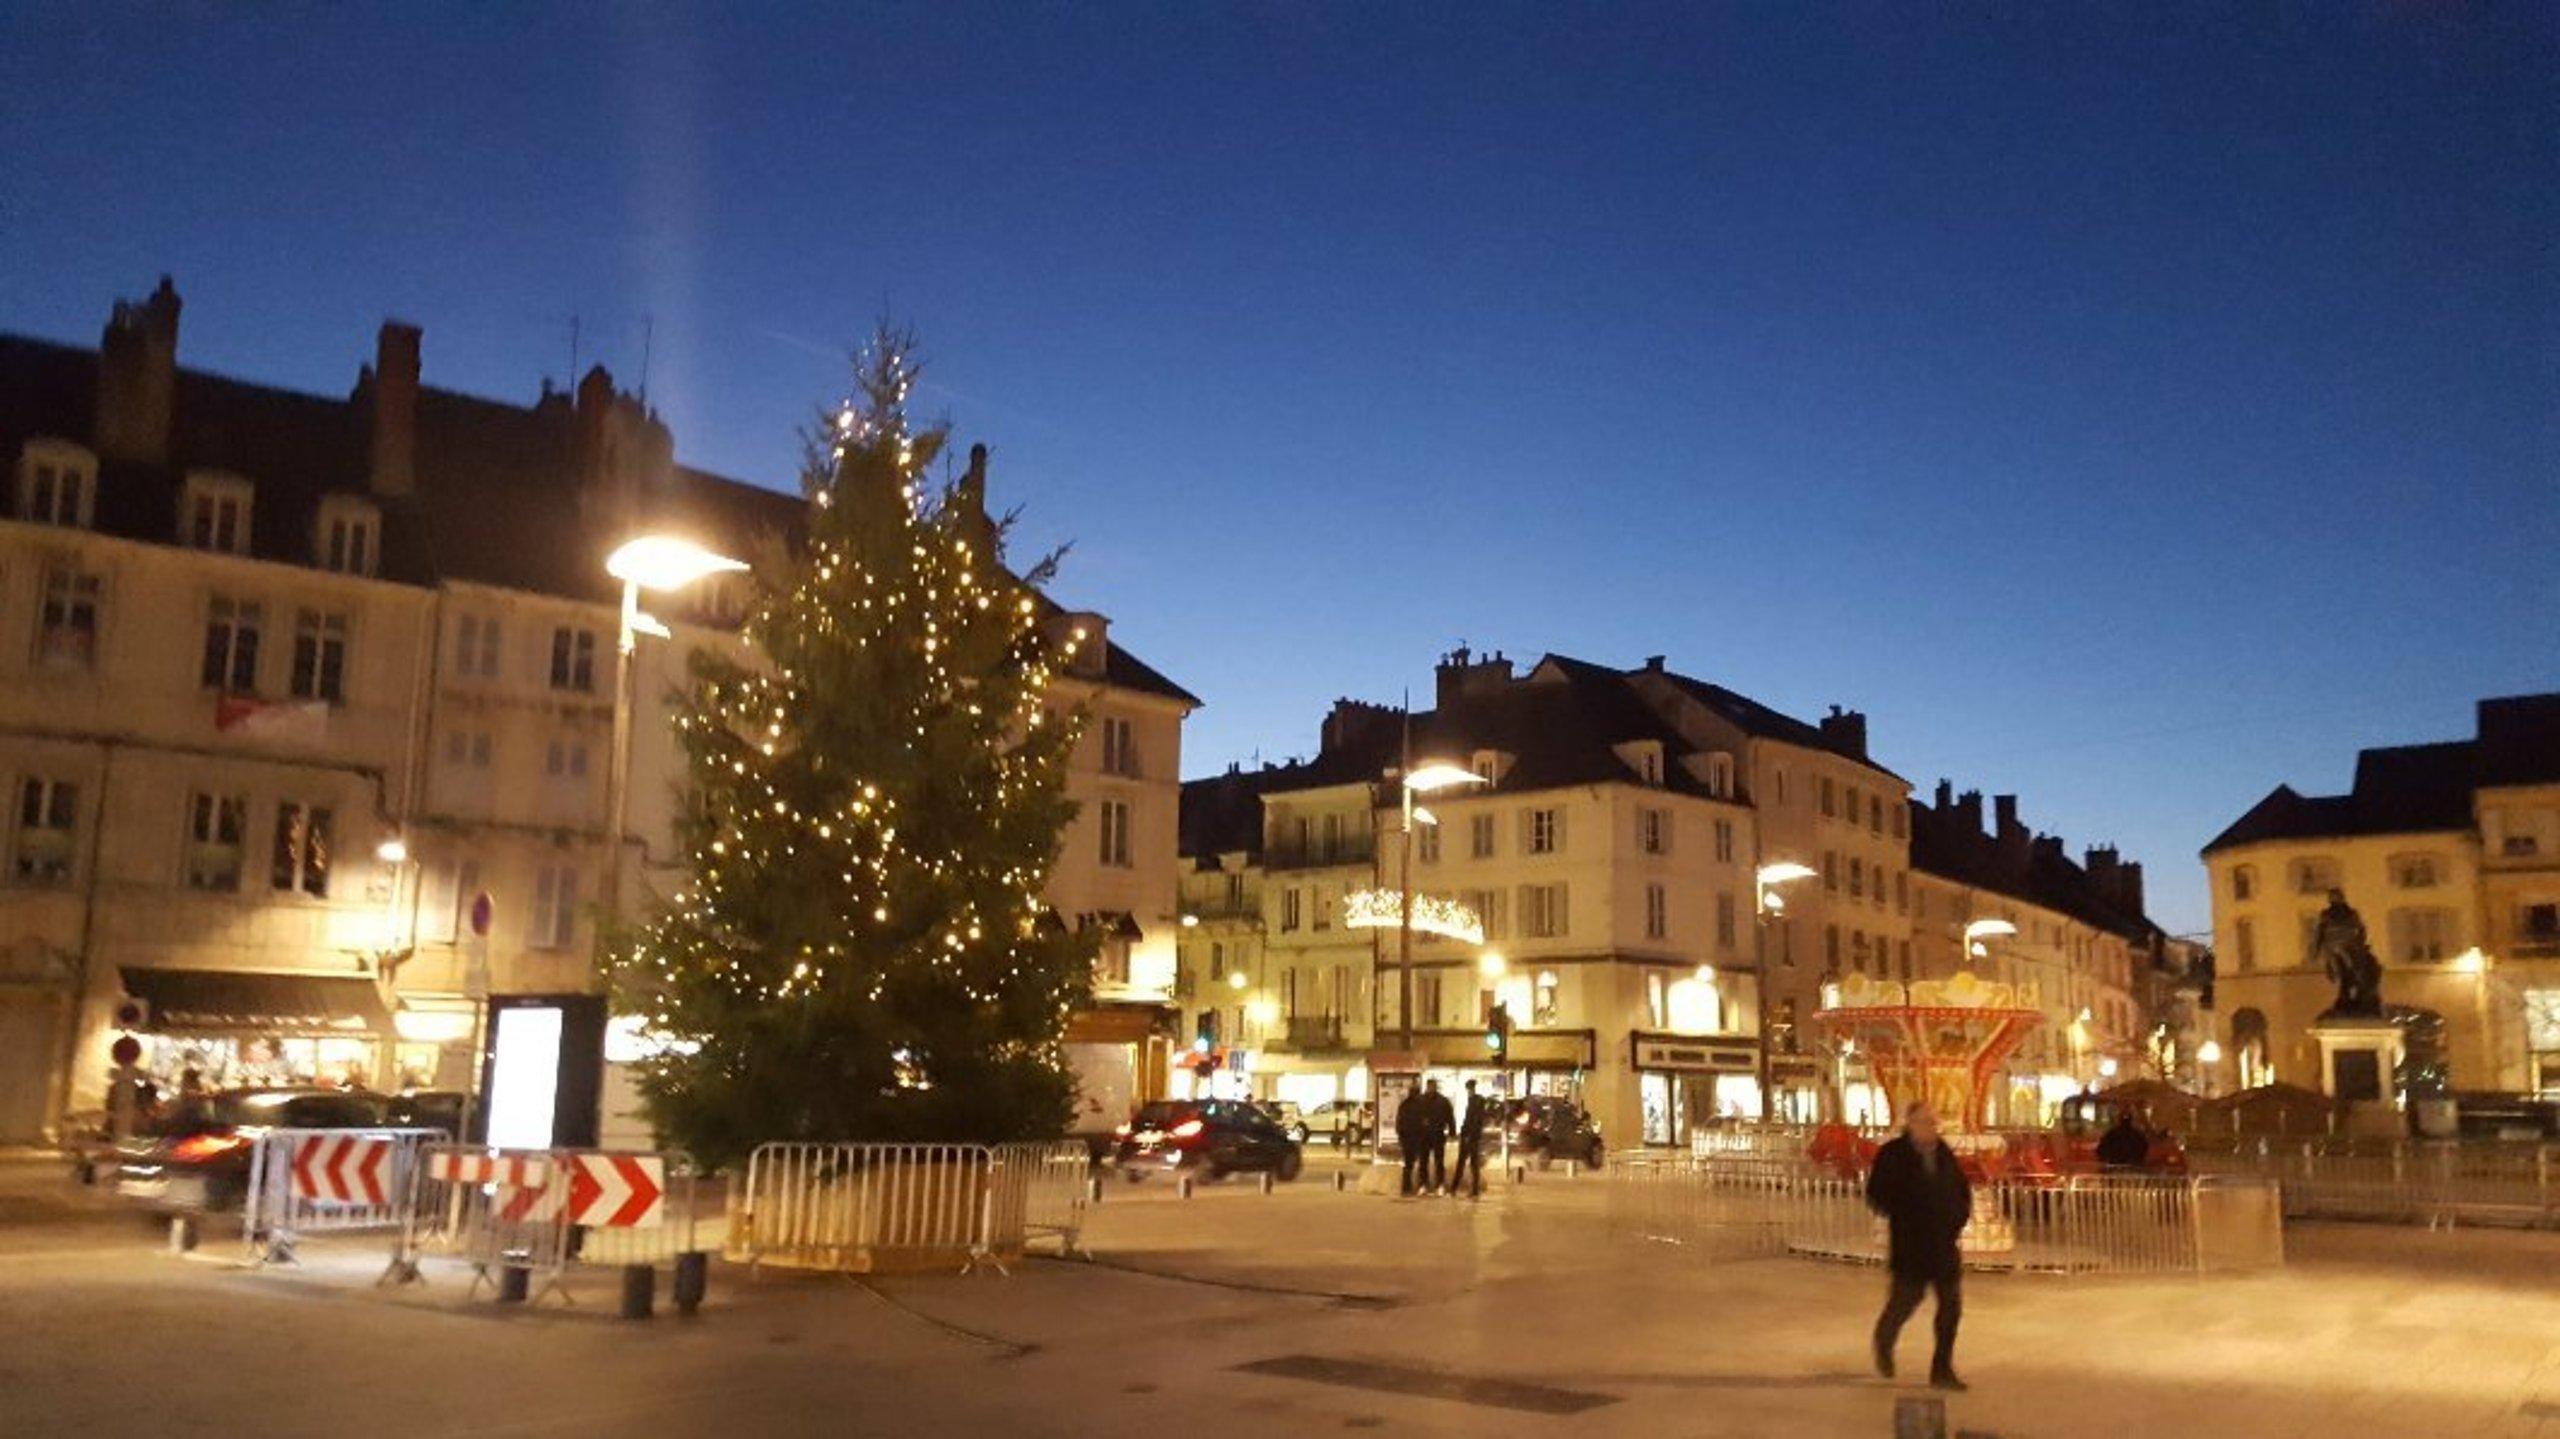 Hotel Du Beryl Lons Le Saunier Tarifs 2020 Mis A Jour 196 Avis Et 38 Photos Tripadvisor